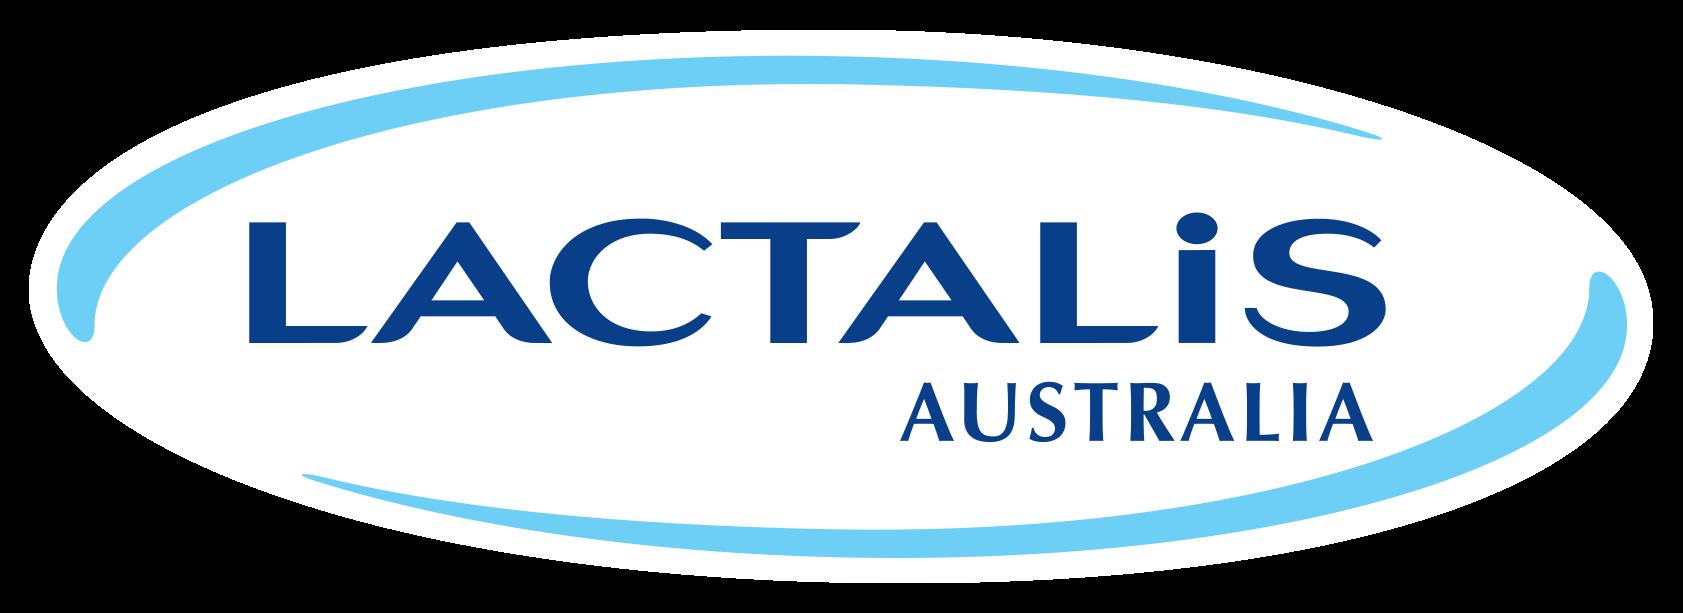 Lactalis Australia Pty Ltd